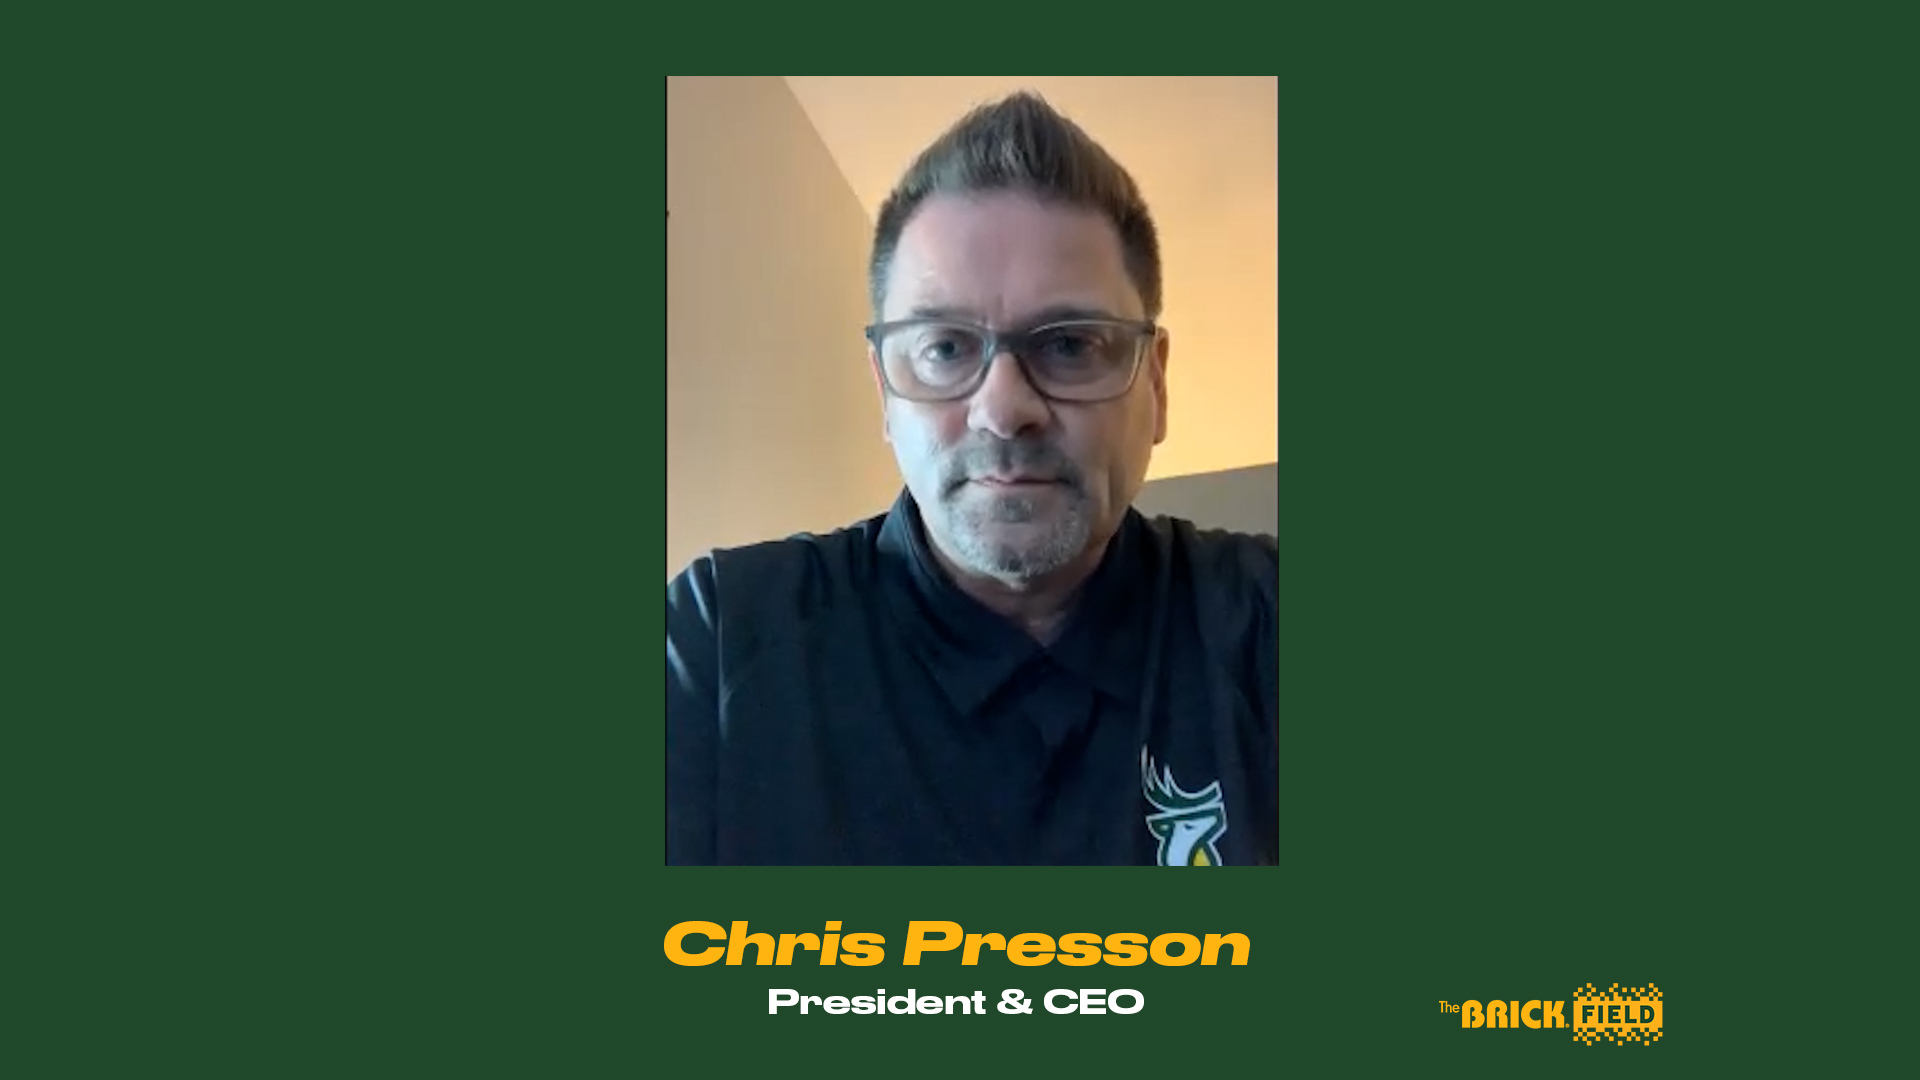 President & CEO Chris Presson Provides Update